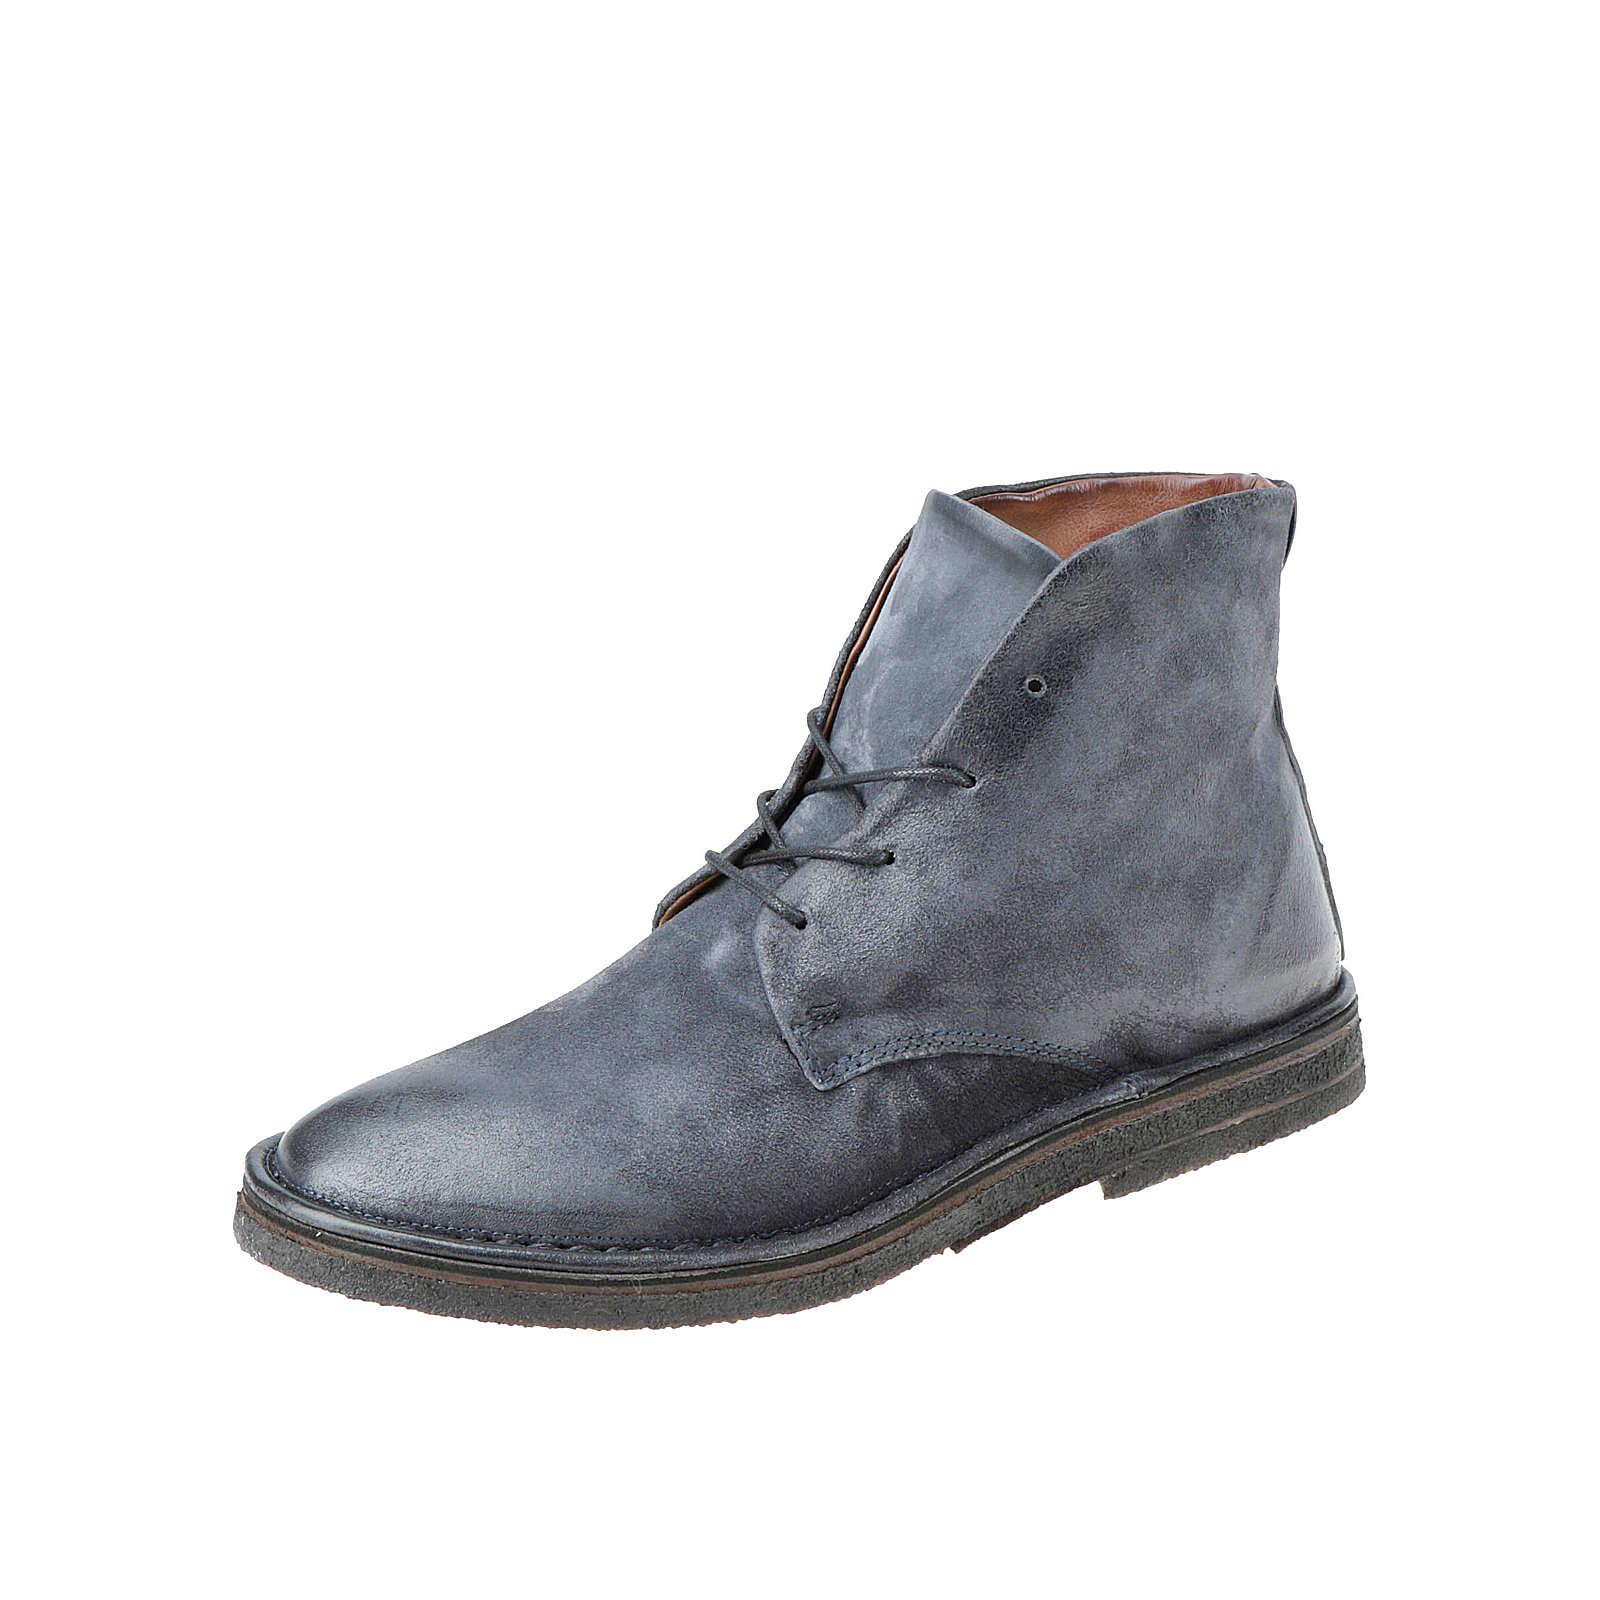 A.S.98 Stiefeletten Klassische Stiefel dunkelblau Herren Gr. 46